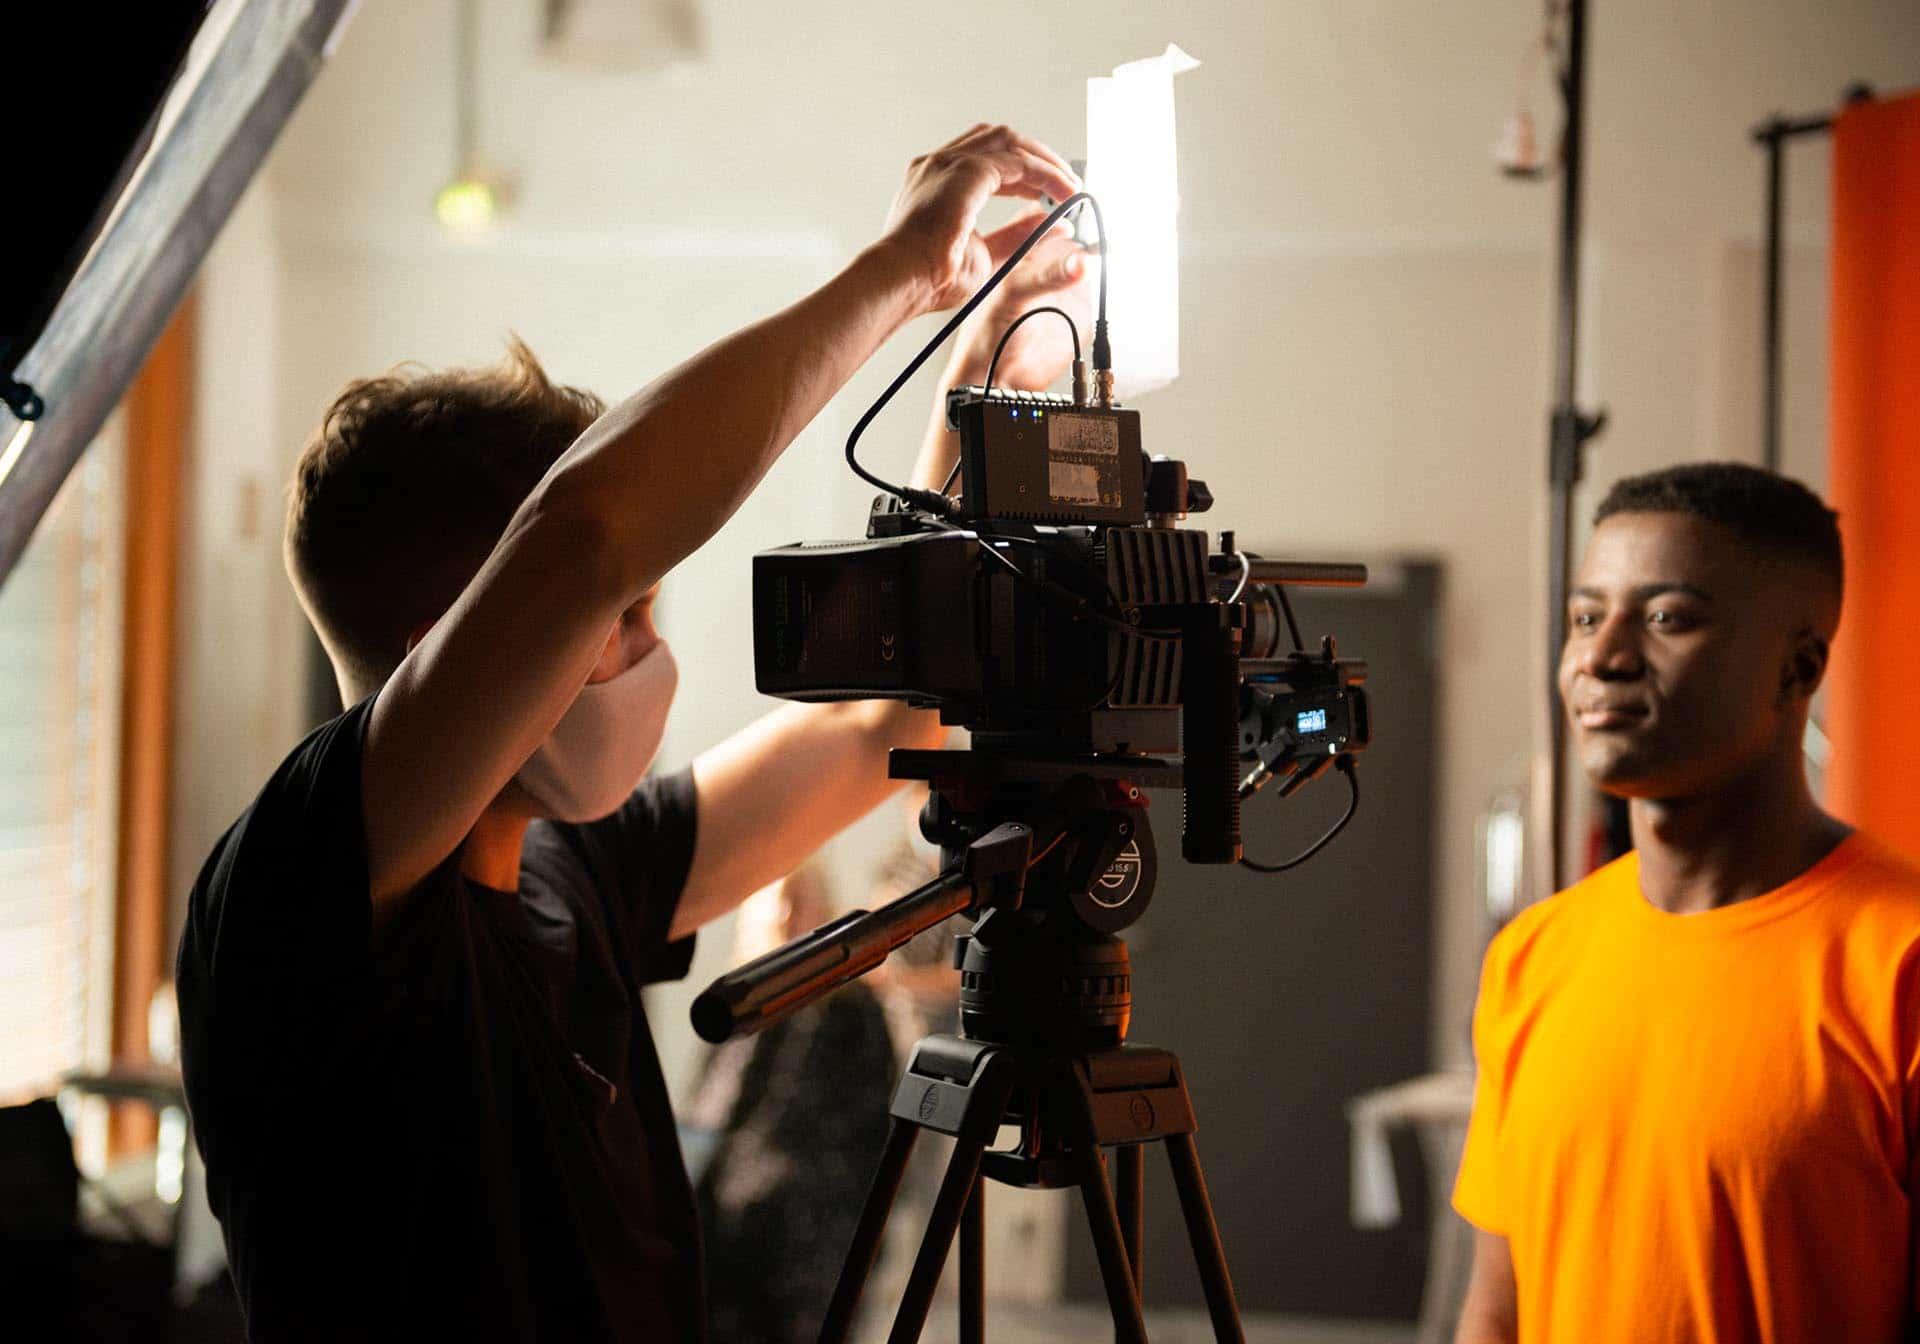 Making-Of Video Kameramann, Schmincktisch, Entwicklung Azubi-Kampagne für Westfalen Group, Webdesign, Videoclips, Social-Media, Werbung